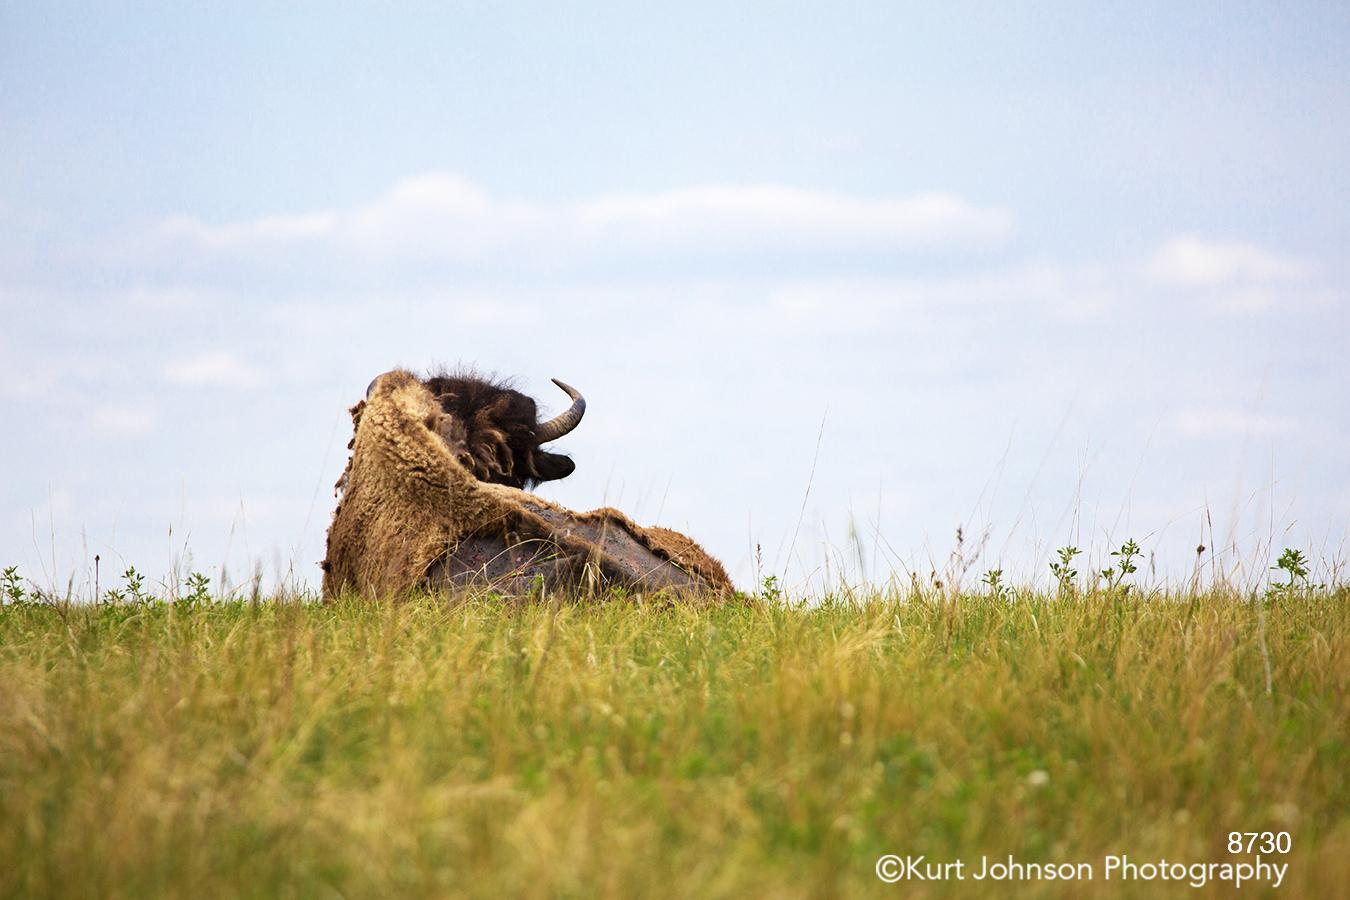 wildlife buffalo antler green grass blue sky clouds farm field landscape